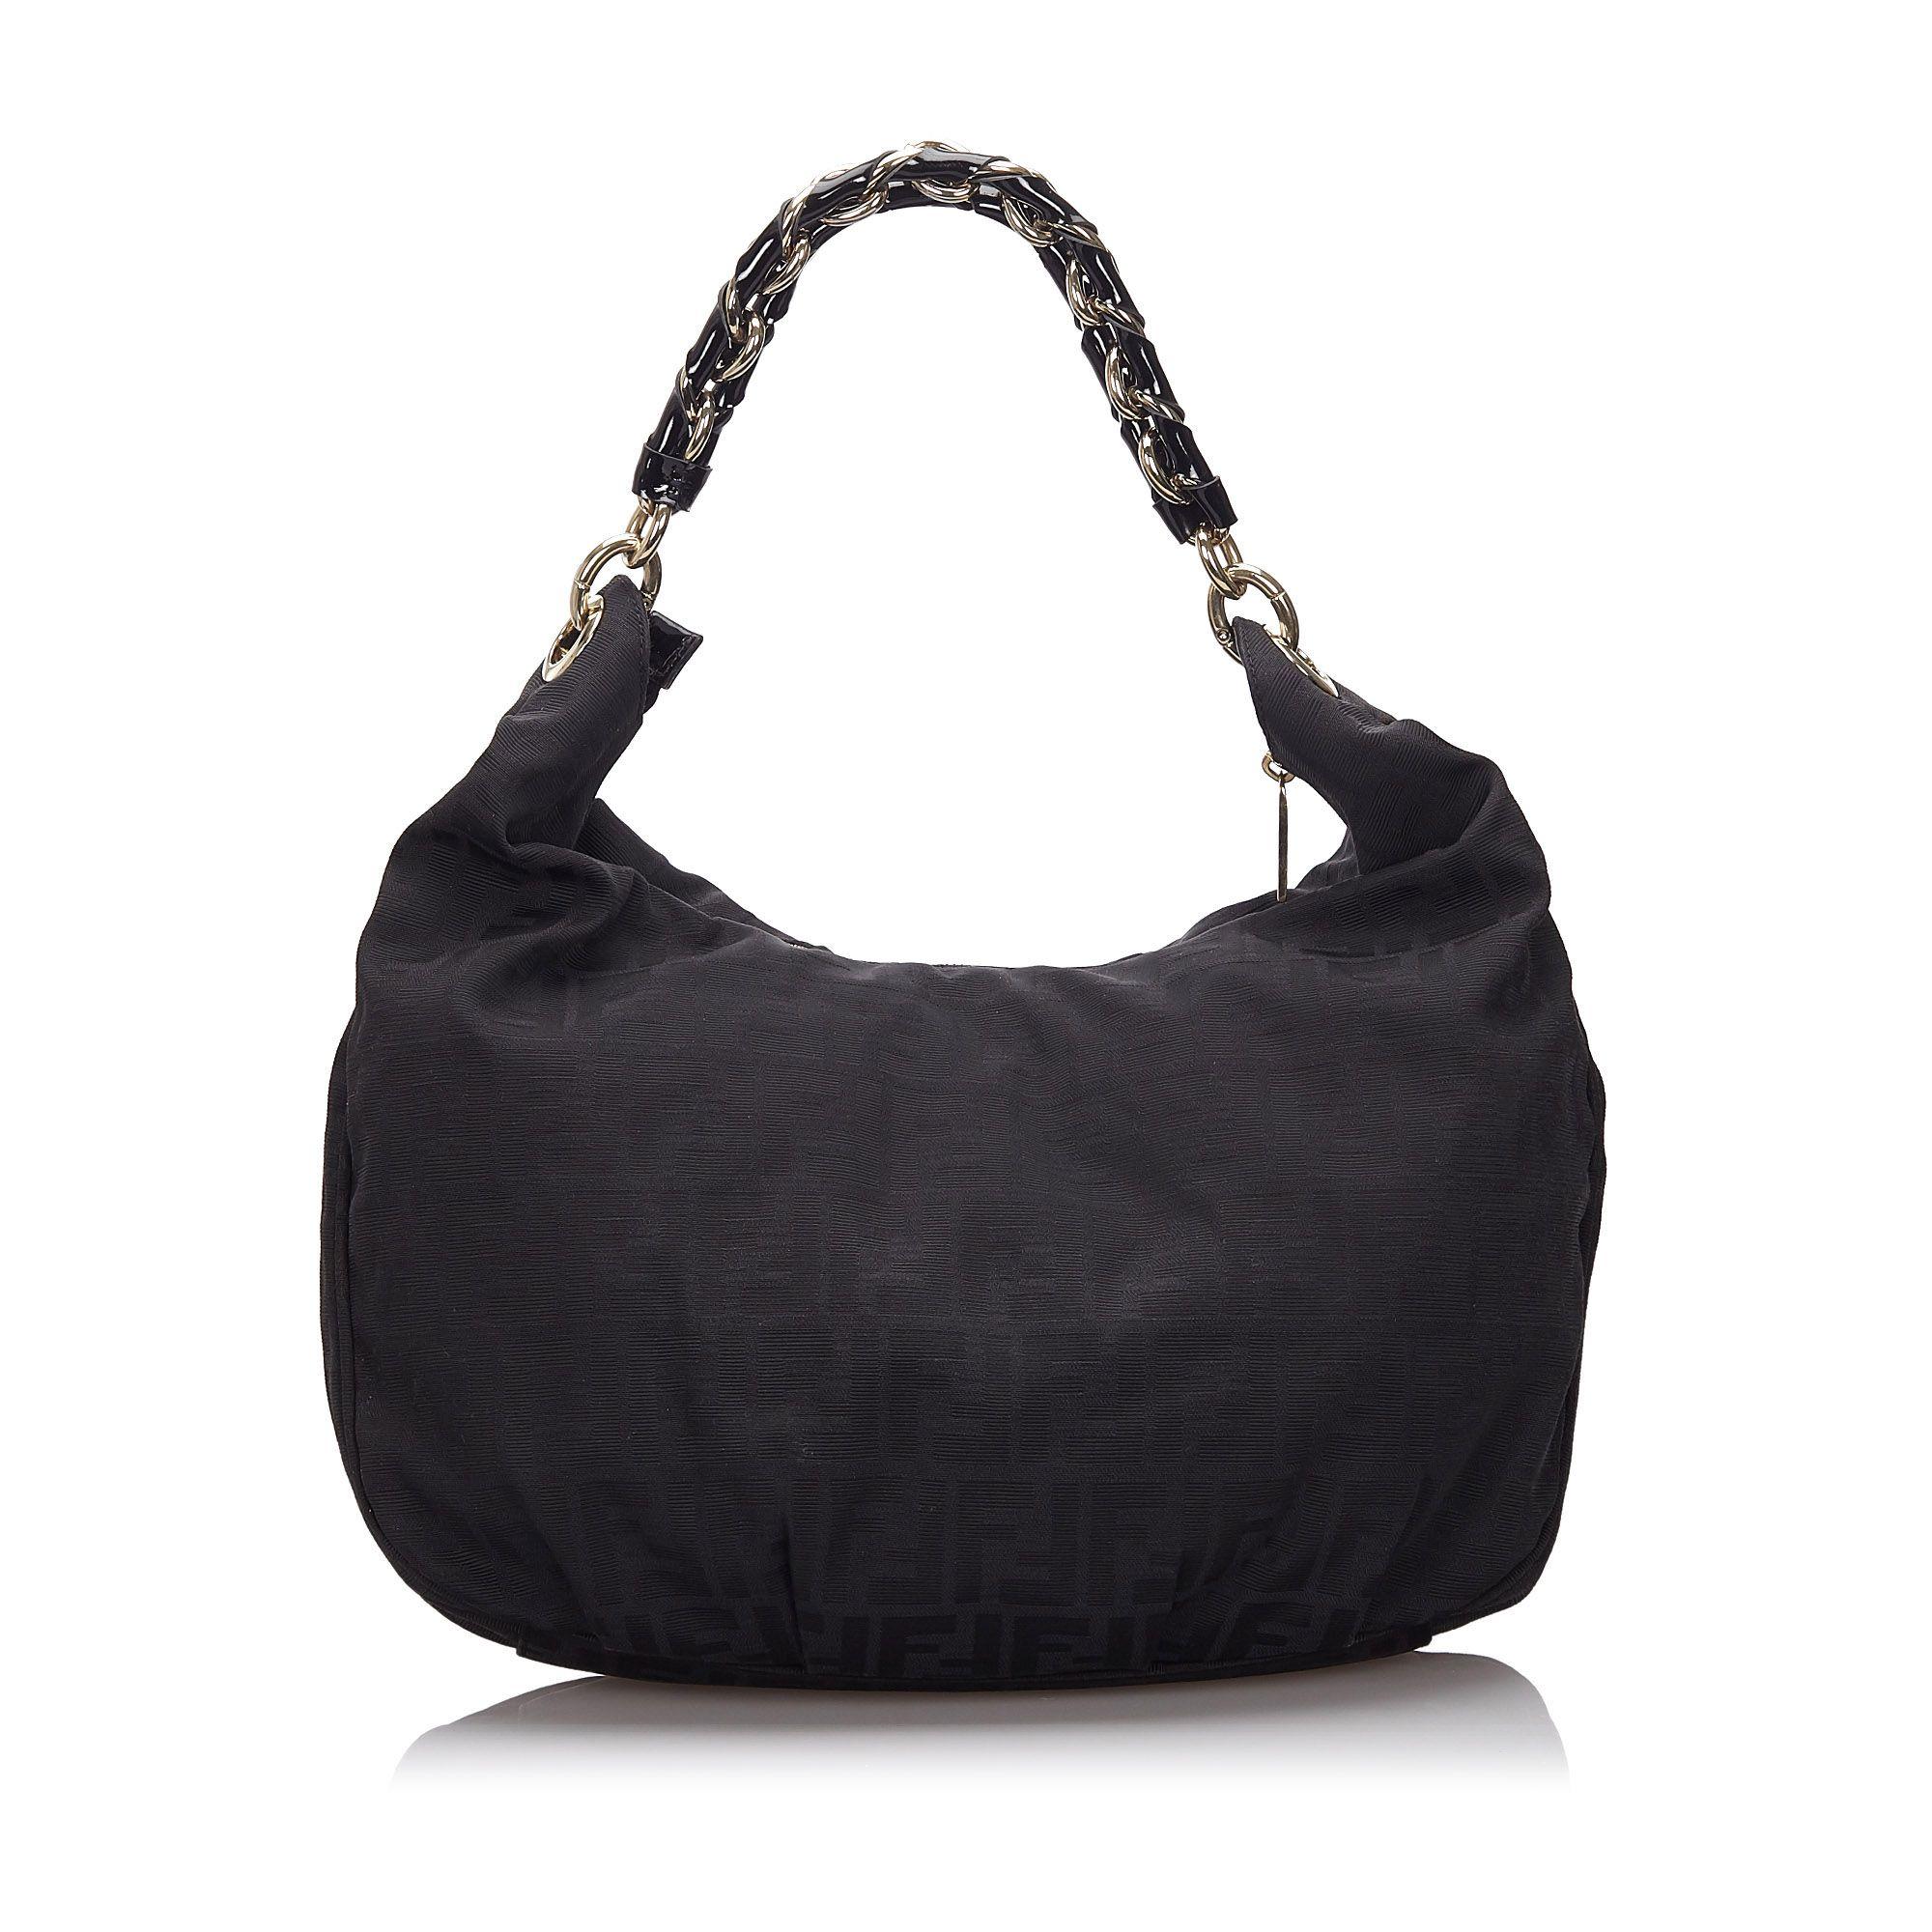 Vintage Fendi Zucca Canvas Mia Shoulder Bag Black